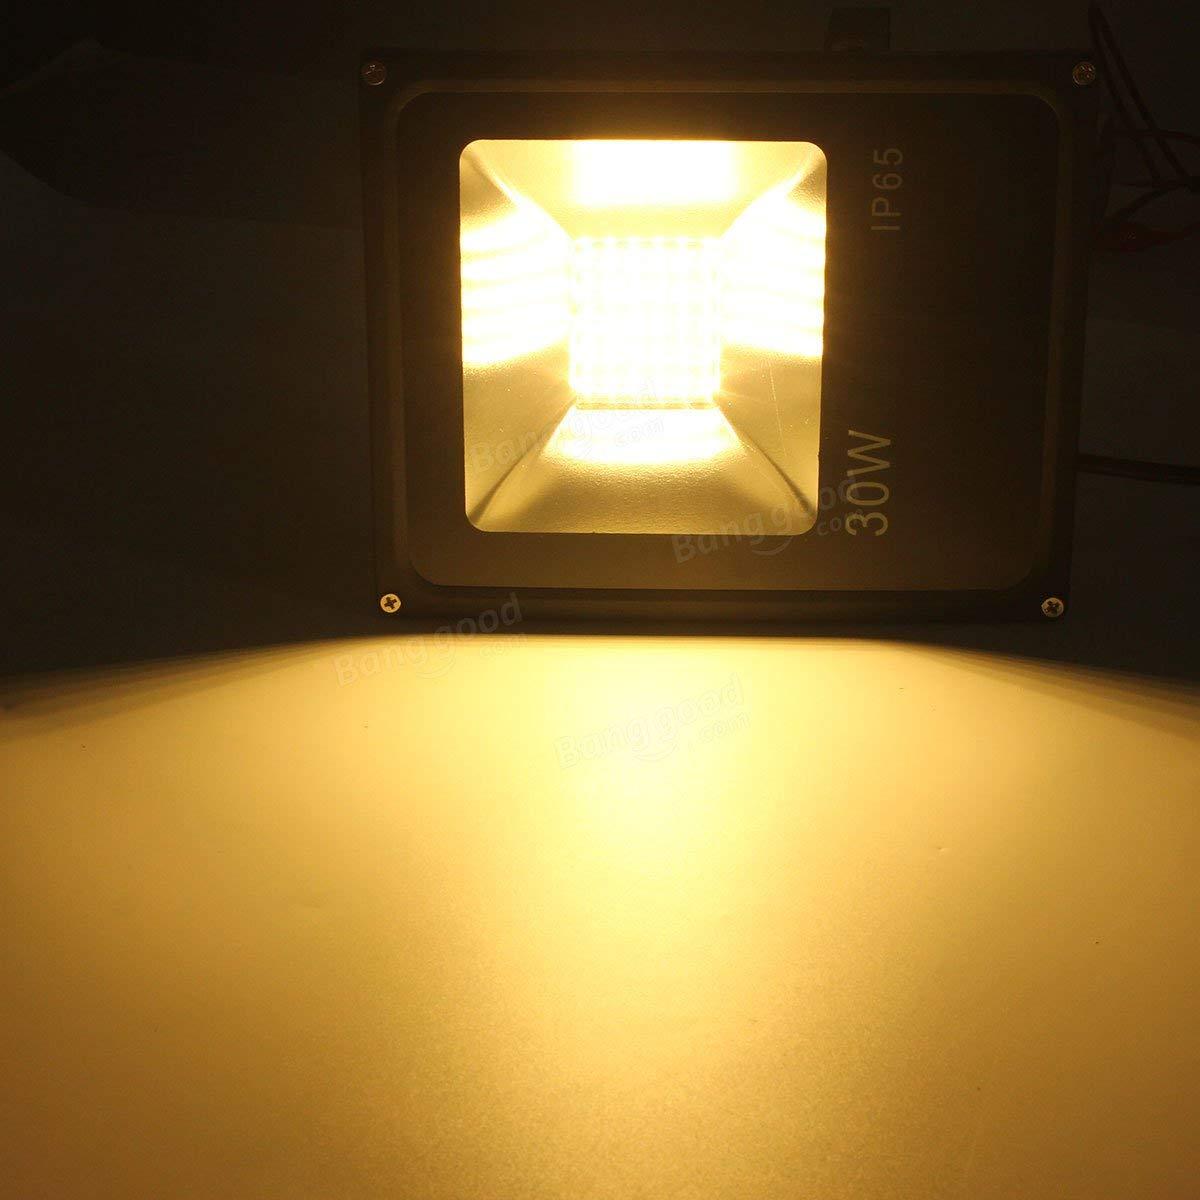 30W 5730 Outdooors Waterproof LED Landscape Flood Garden Lamp - Outdoor Lighting LED Flood Lights - (Warm White) - 1 X LED Flood Light